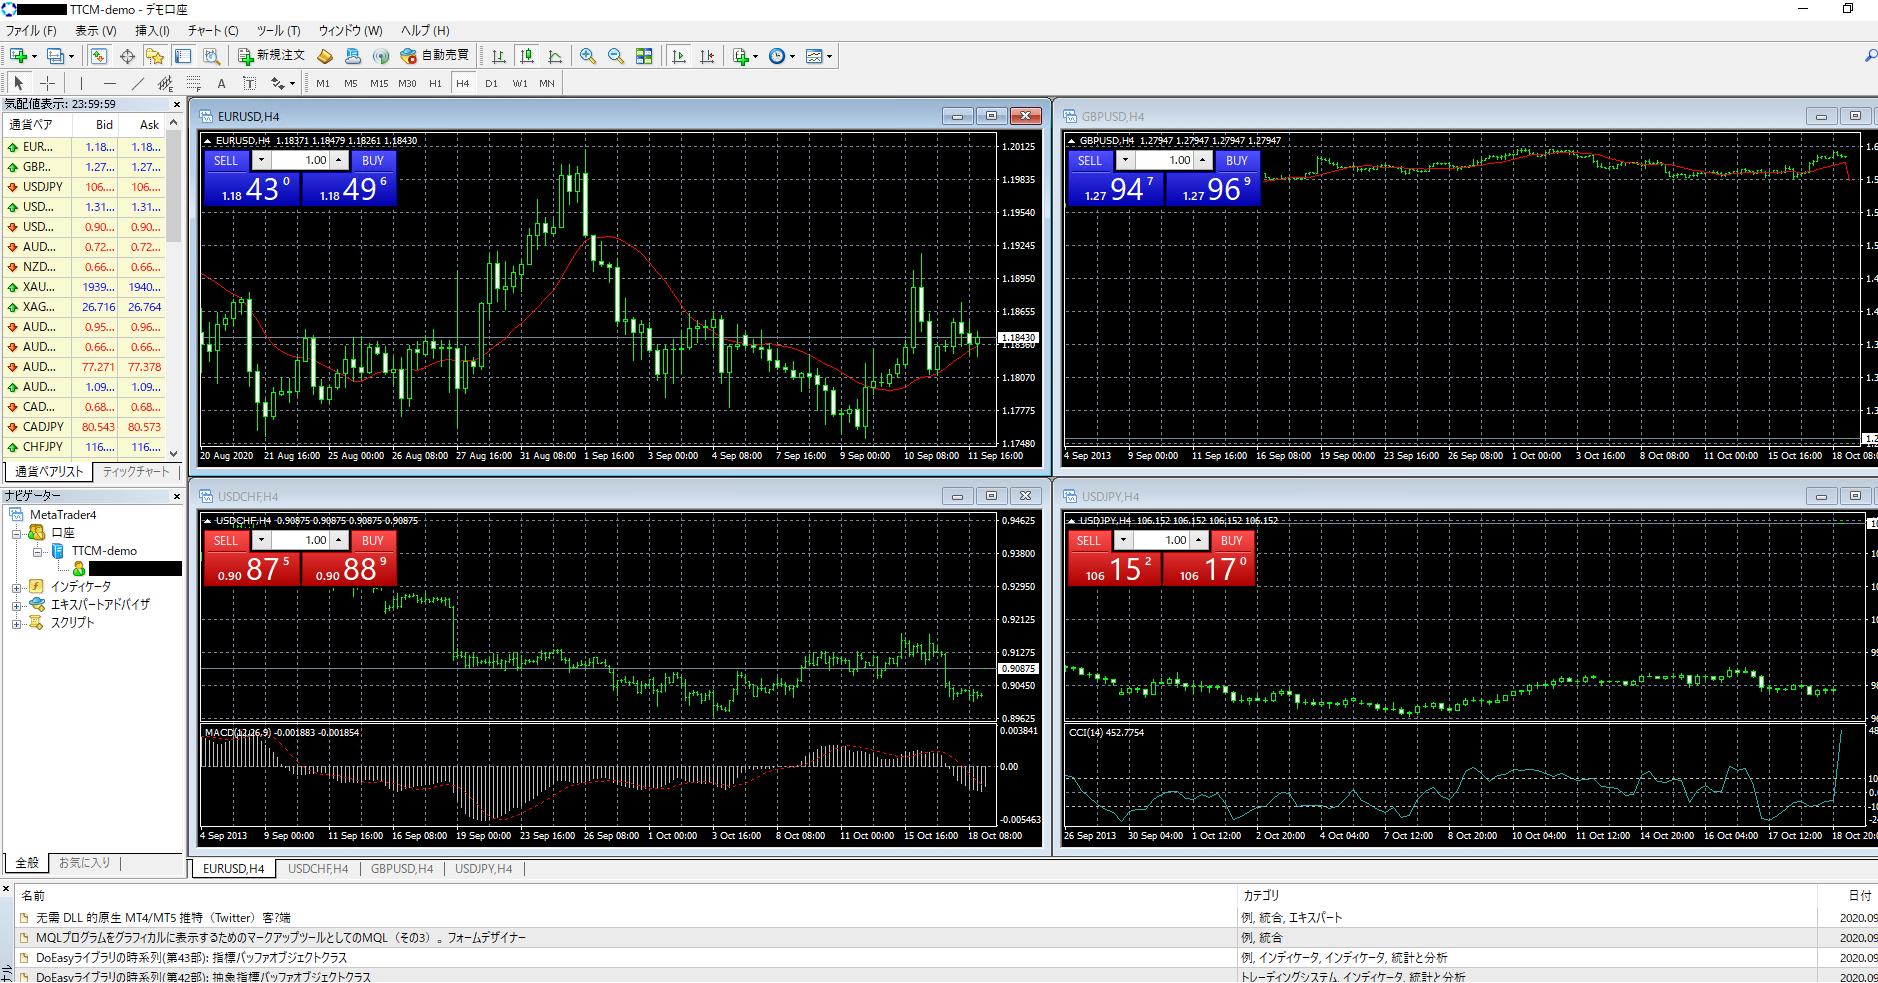 TradersTrustデモ口座MetaTrader4ログイン-ログイン完了画面